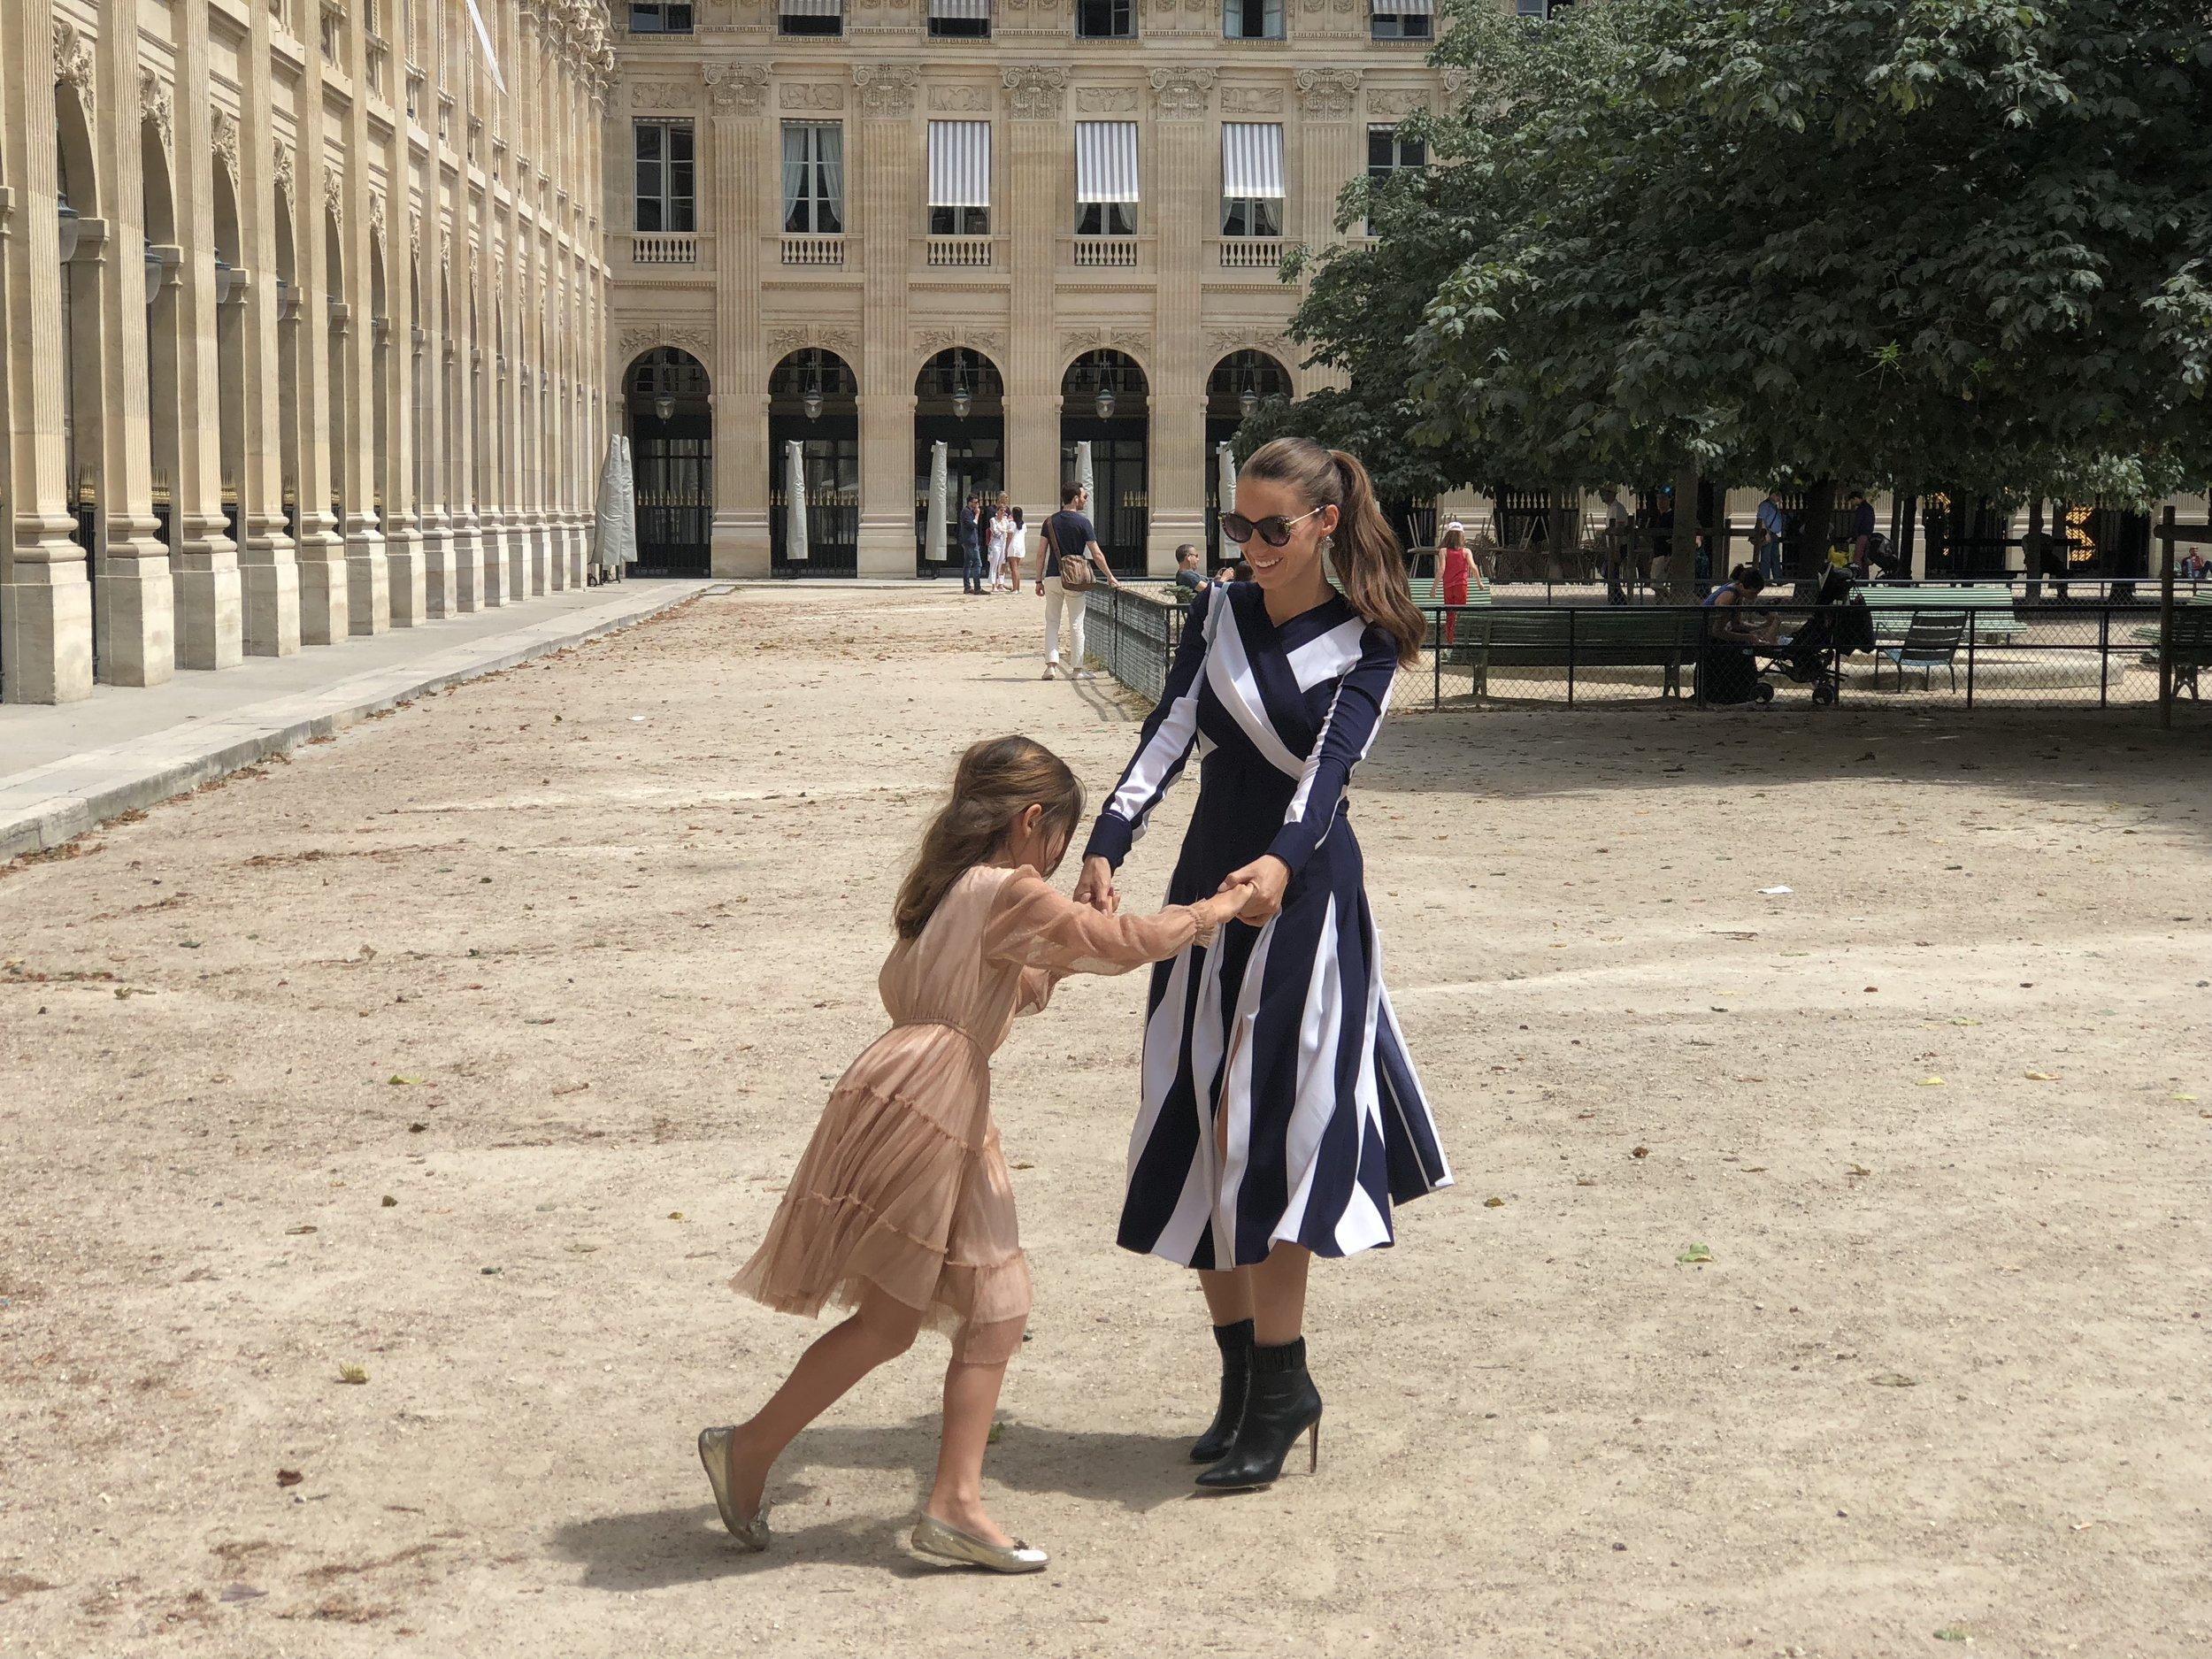 Chloe with daughter Sky in Paris